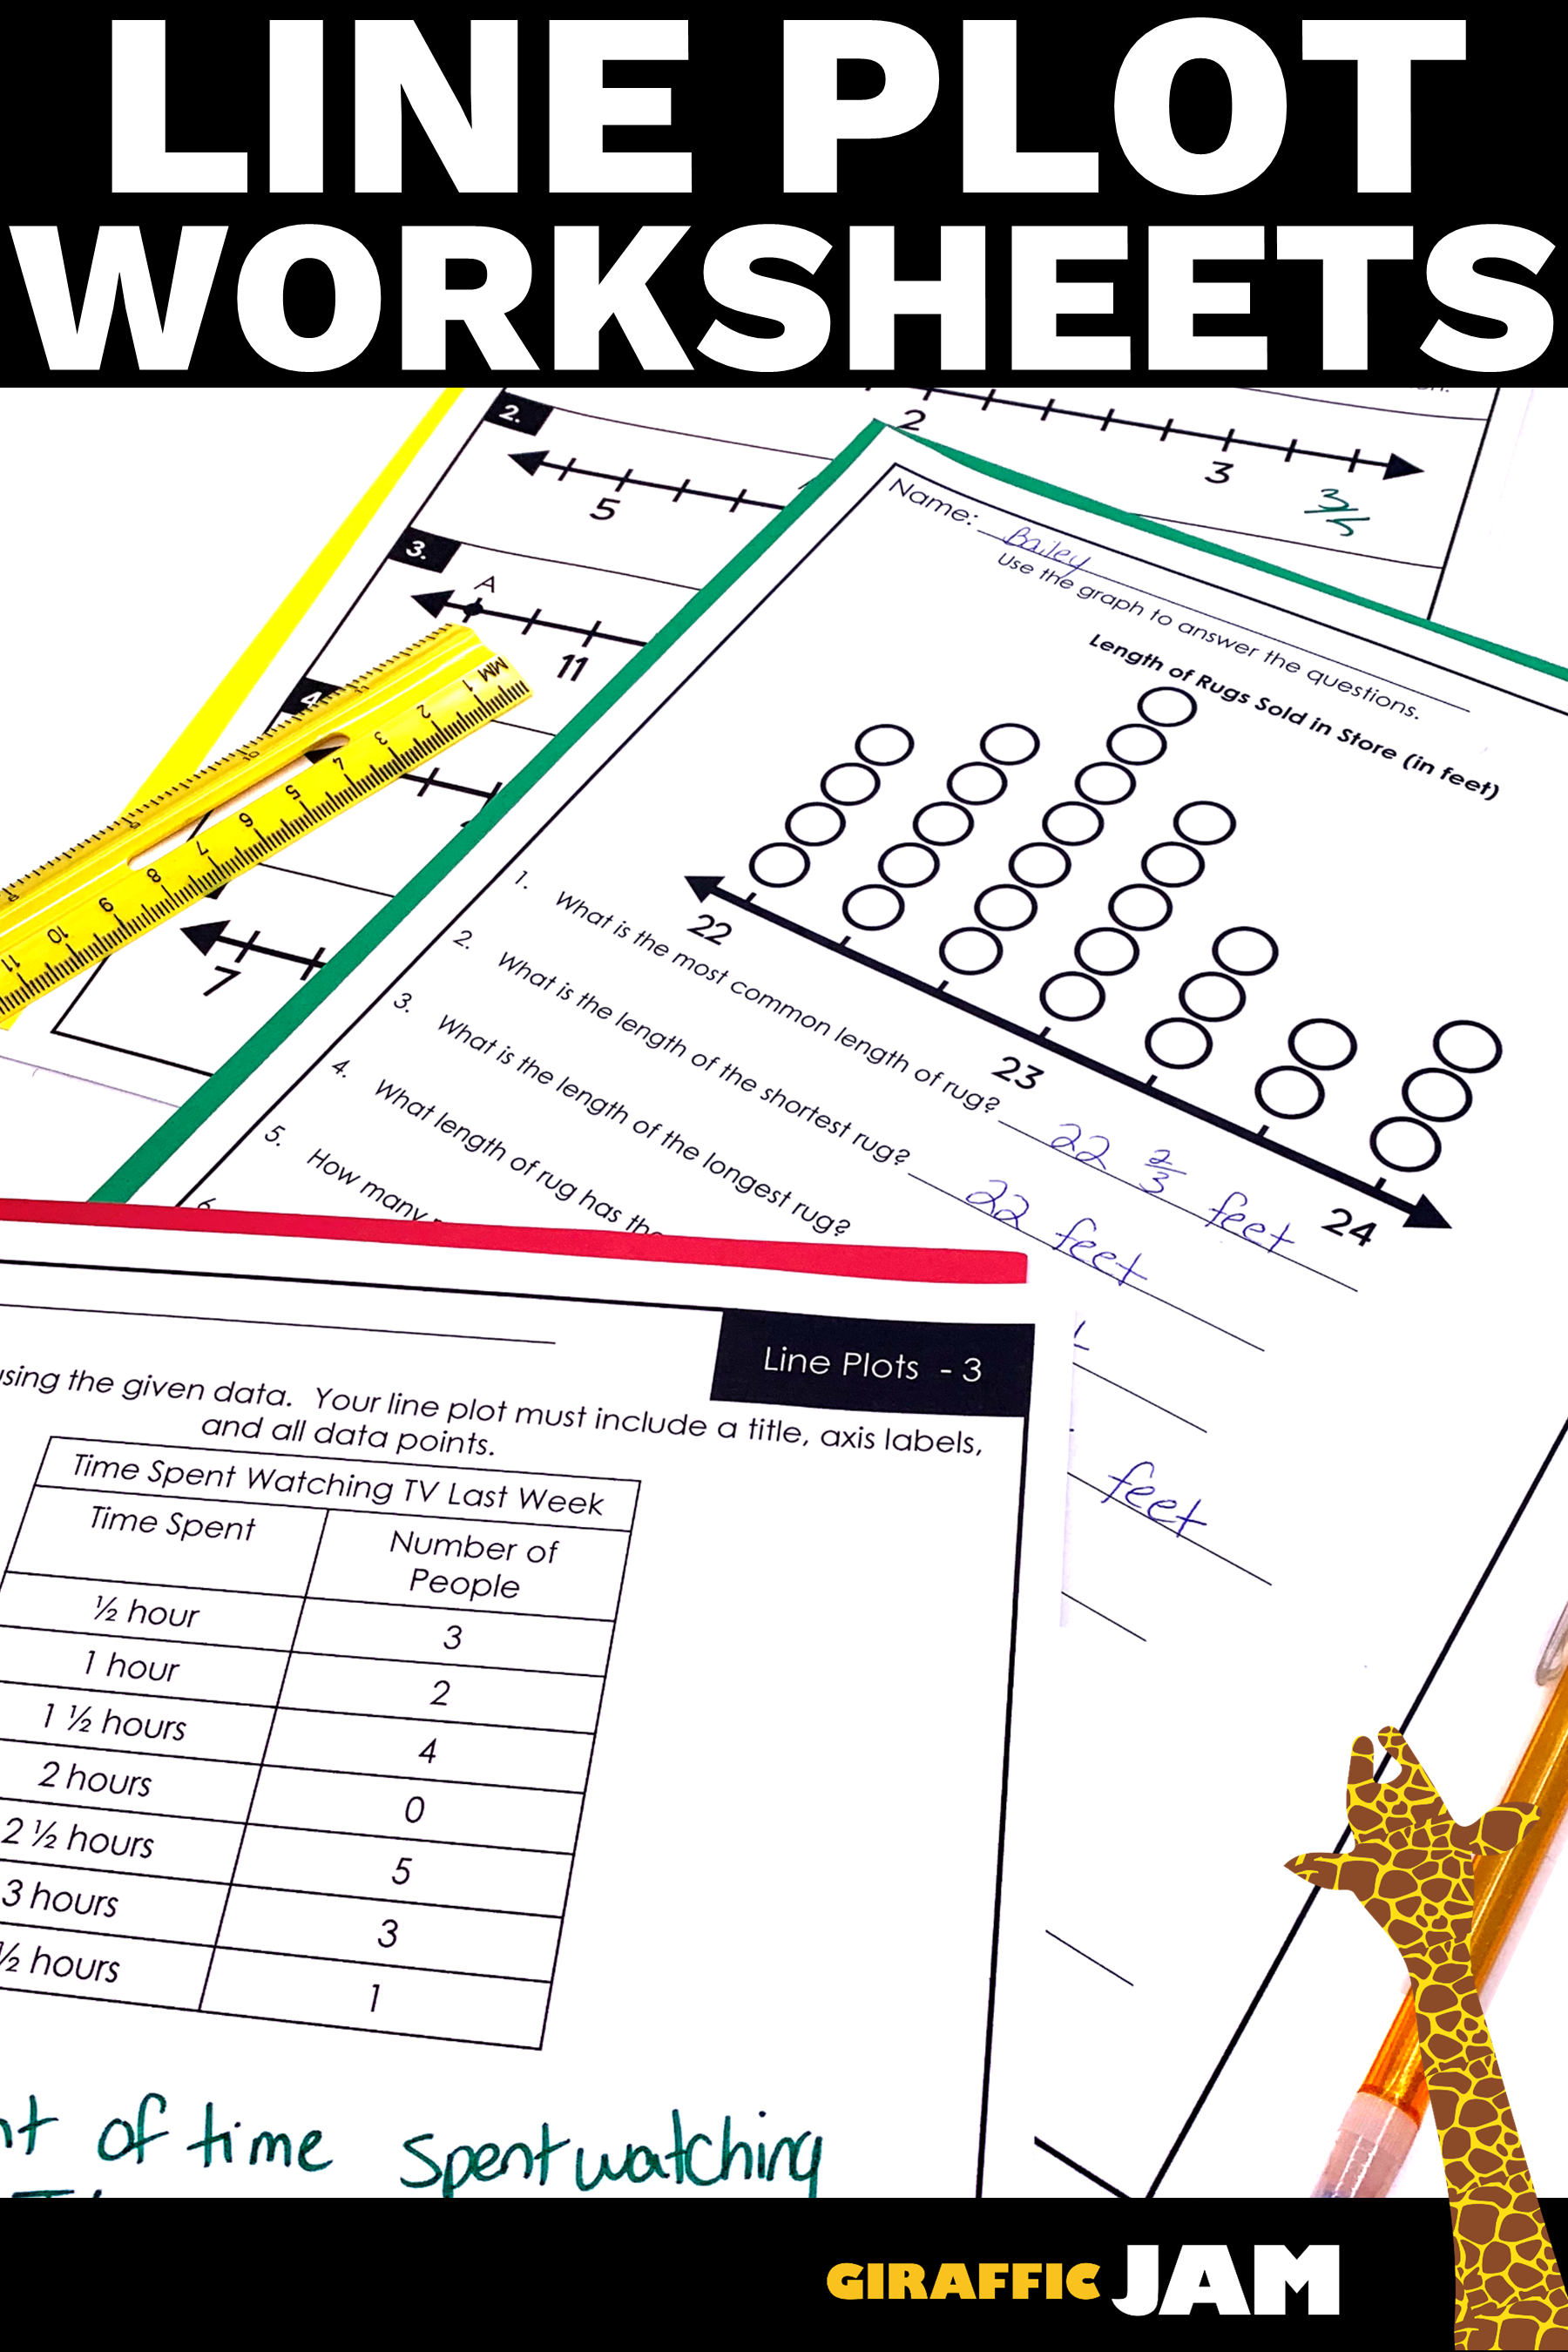 Line Plot Worksheets   Measurement Homework   Measurement Worksheets   Line  plot worksheets [ 2700 x 1800 Pixel ]